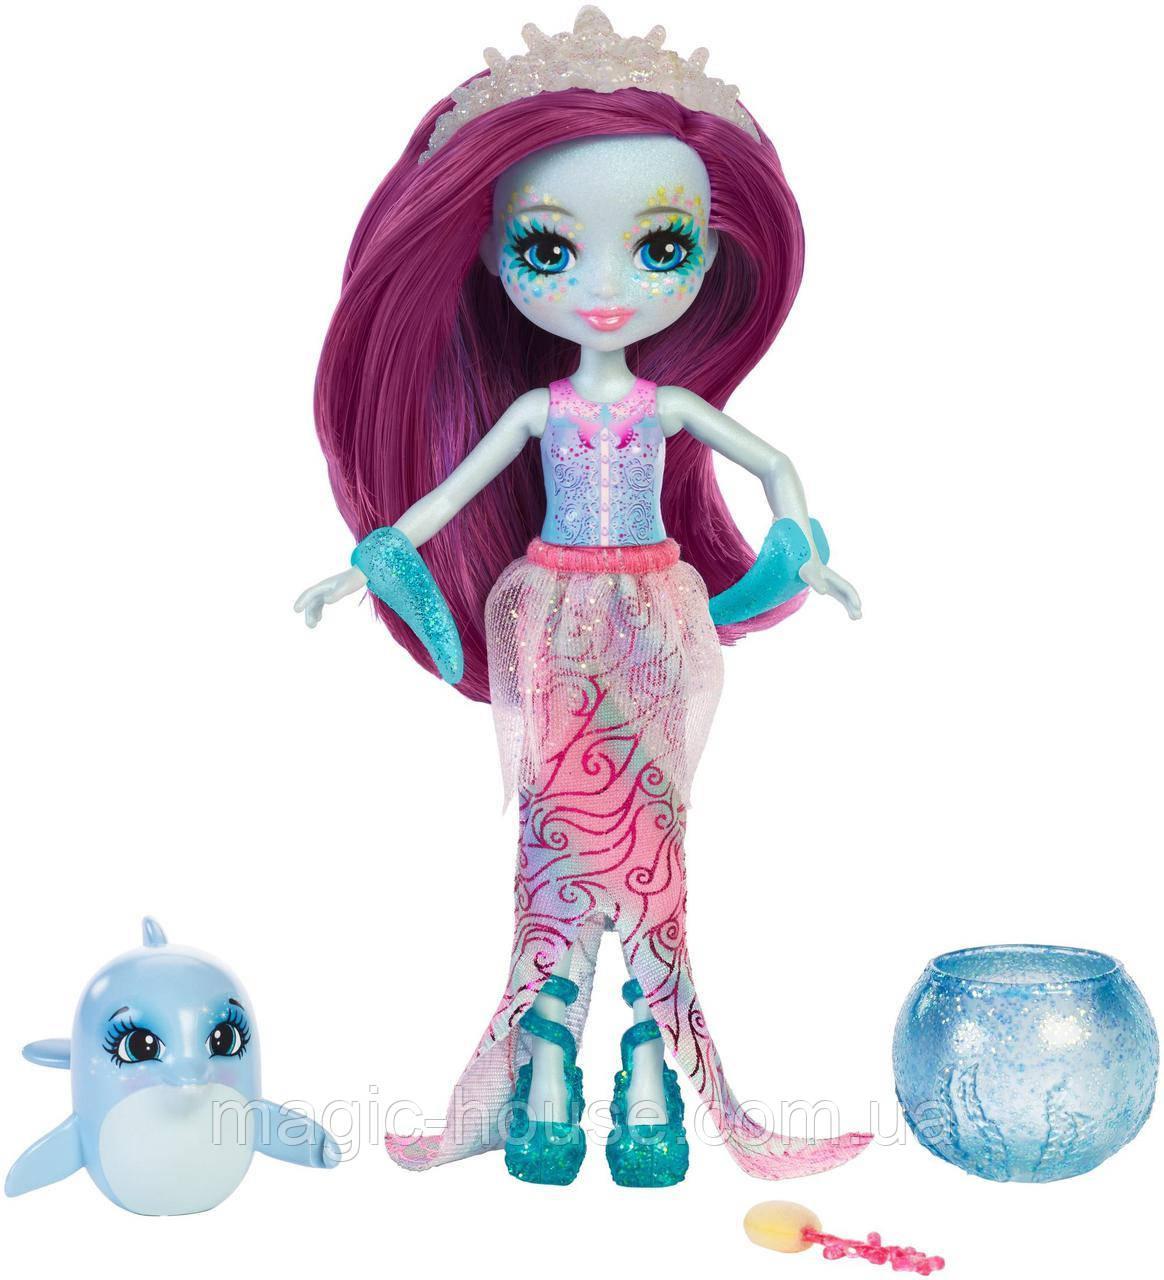 EnchantimalsДельфин Долс и дельфинчик Ларго Dolce Dolphin s Fashion